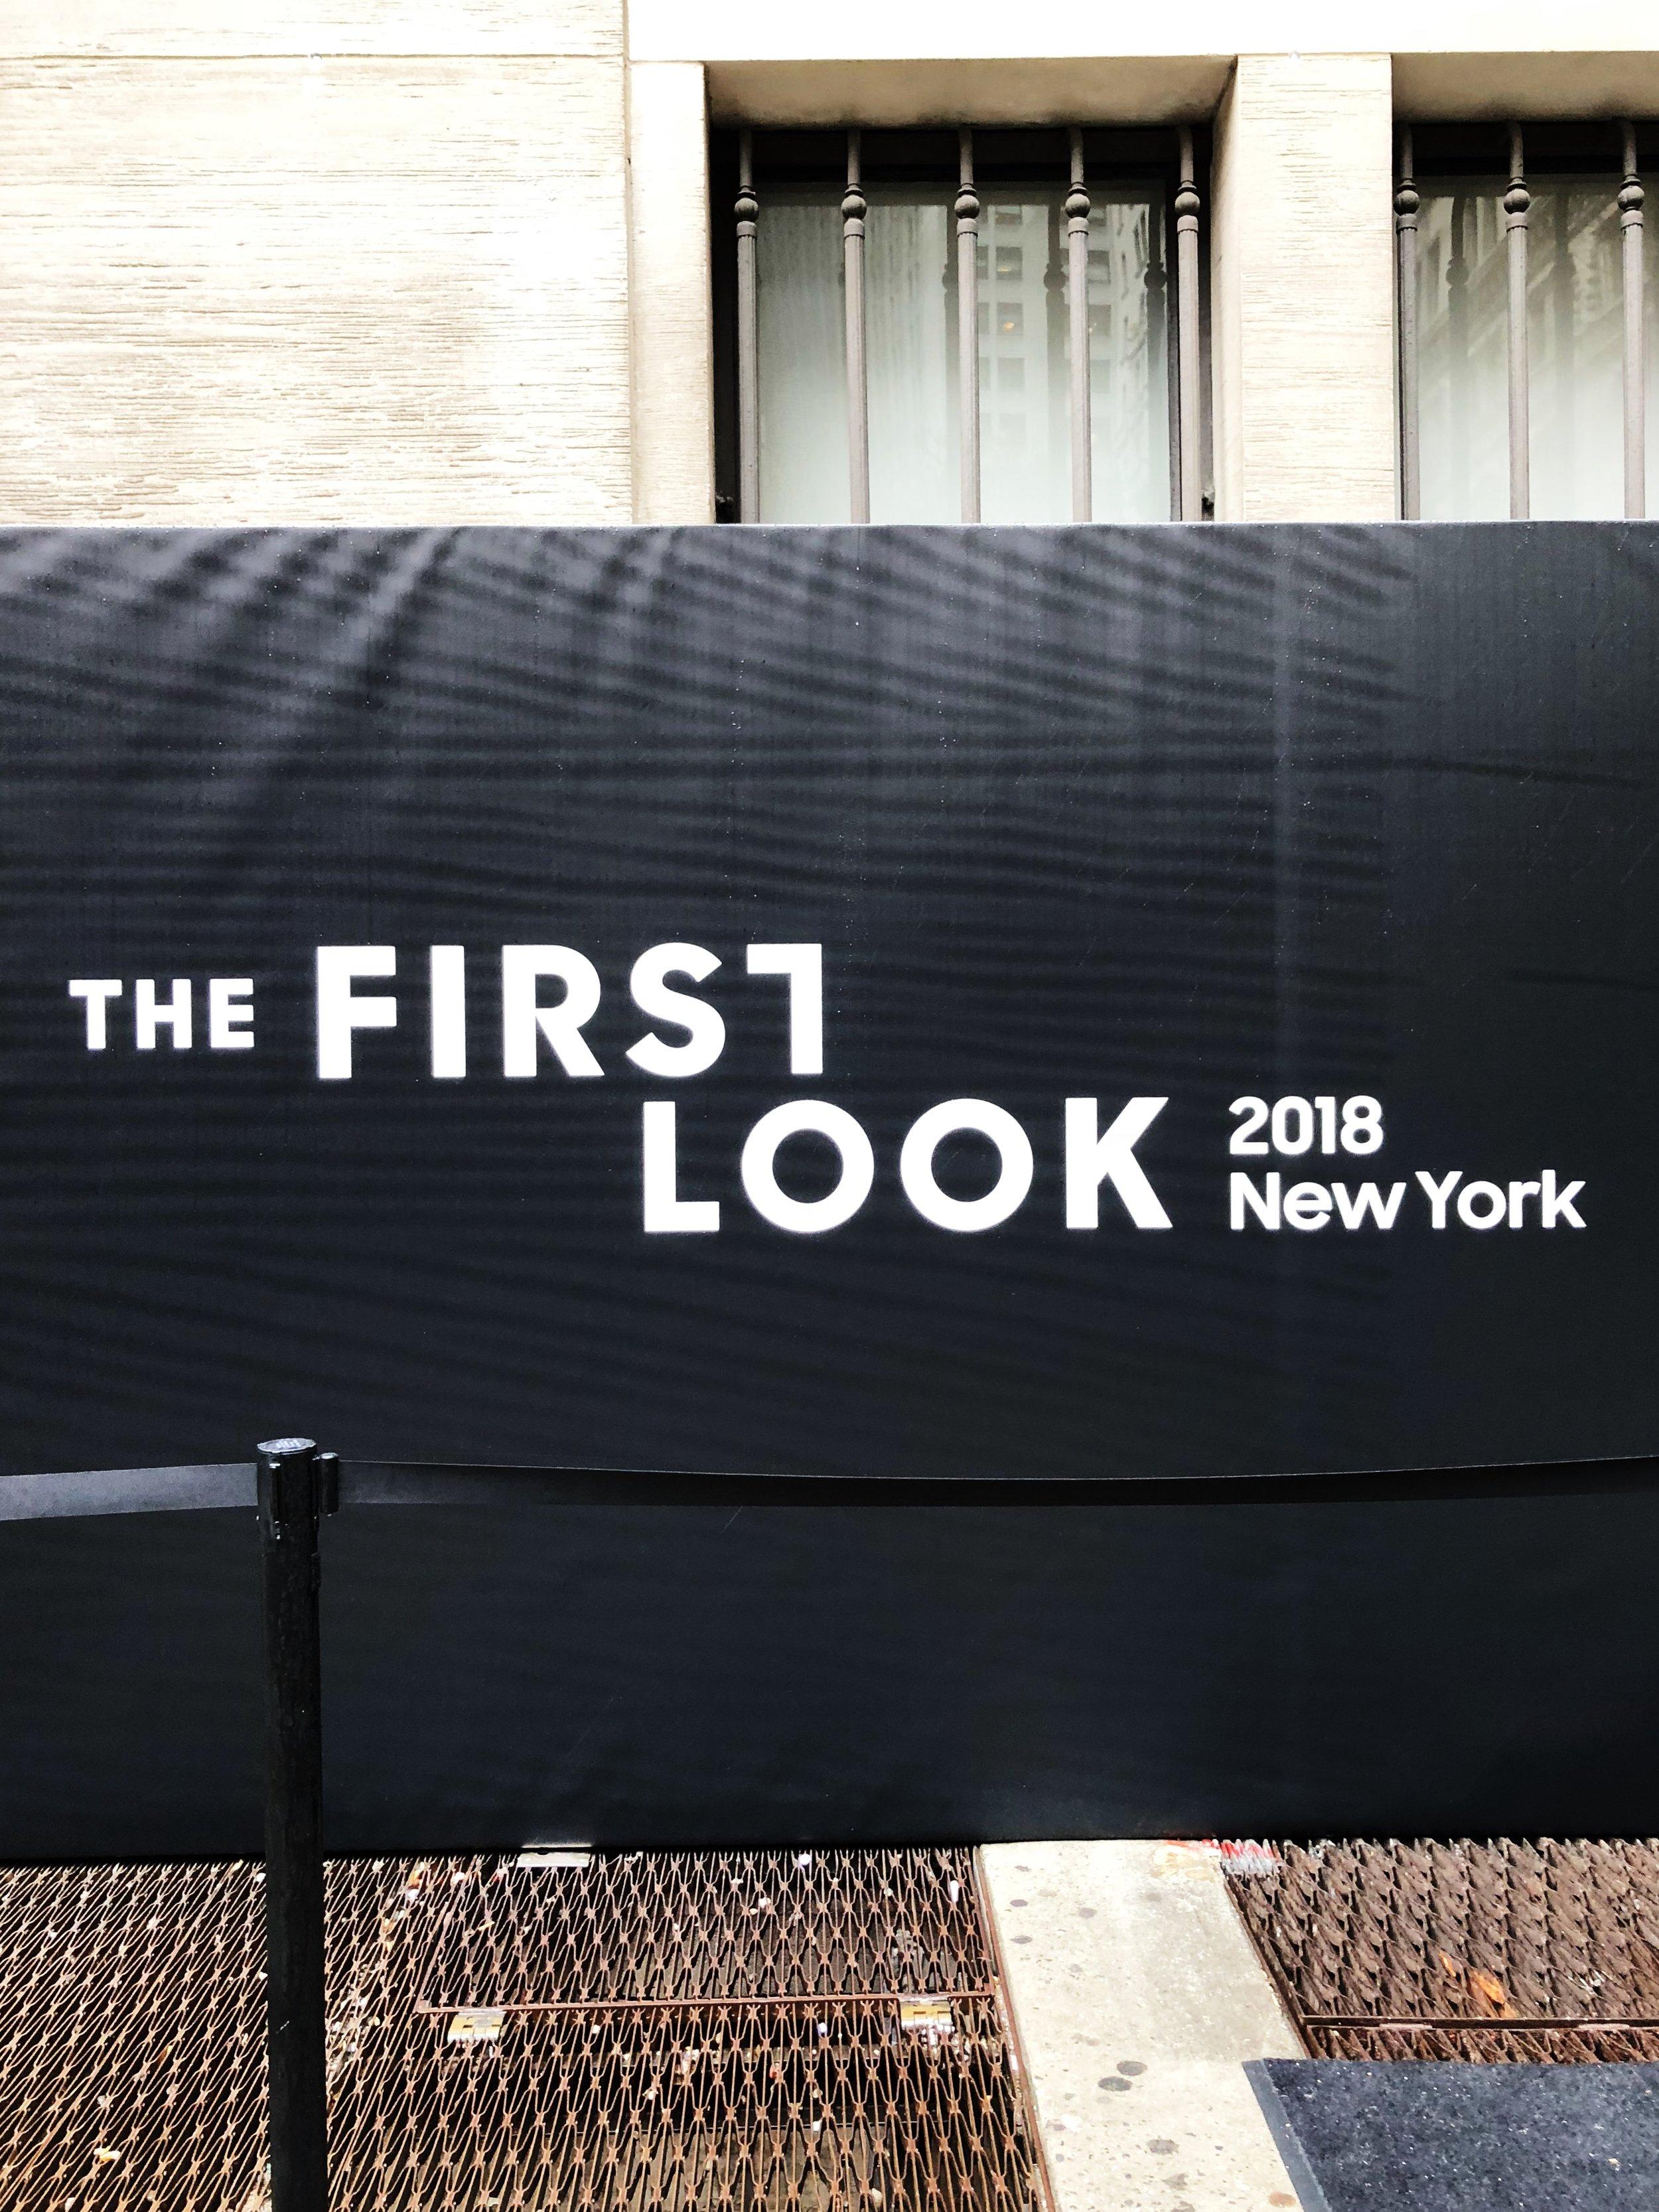 New York New York- First Look